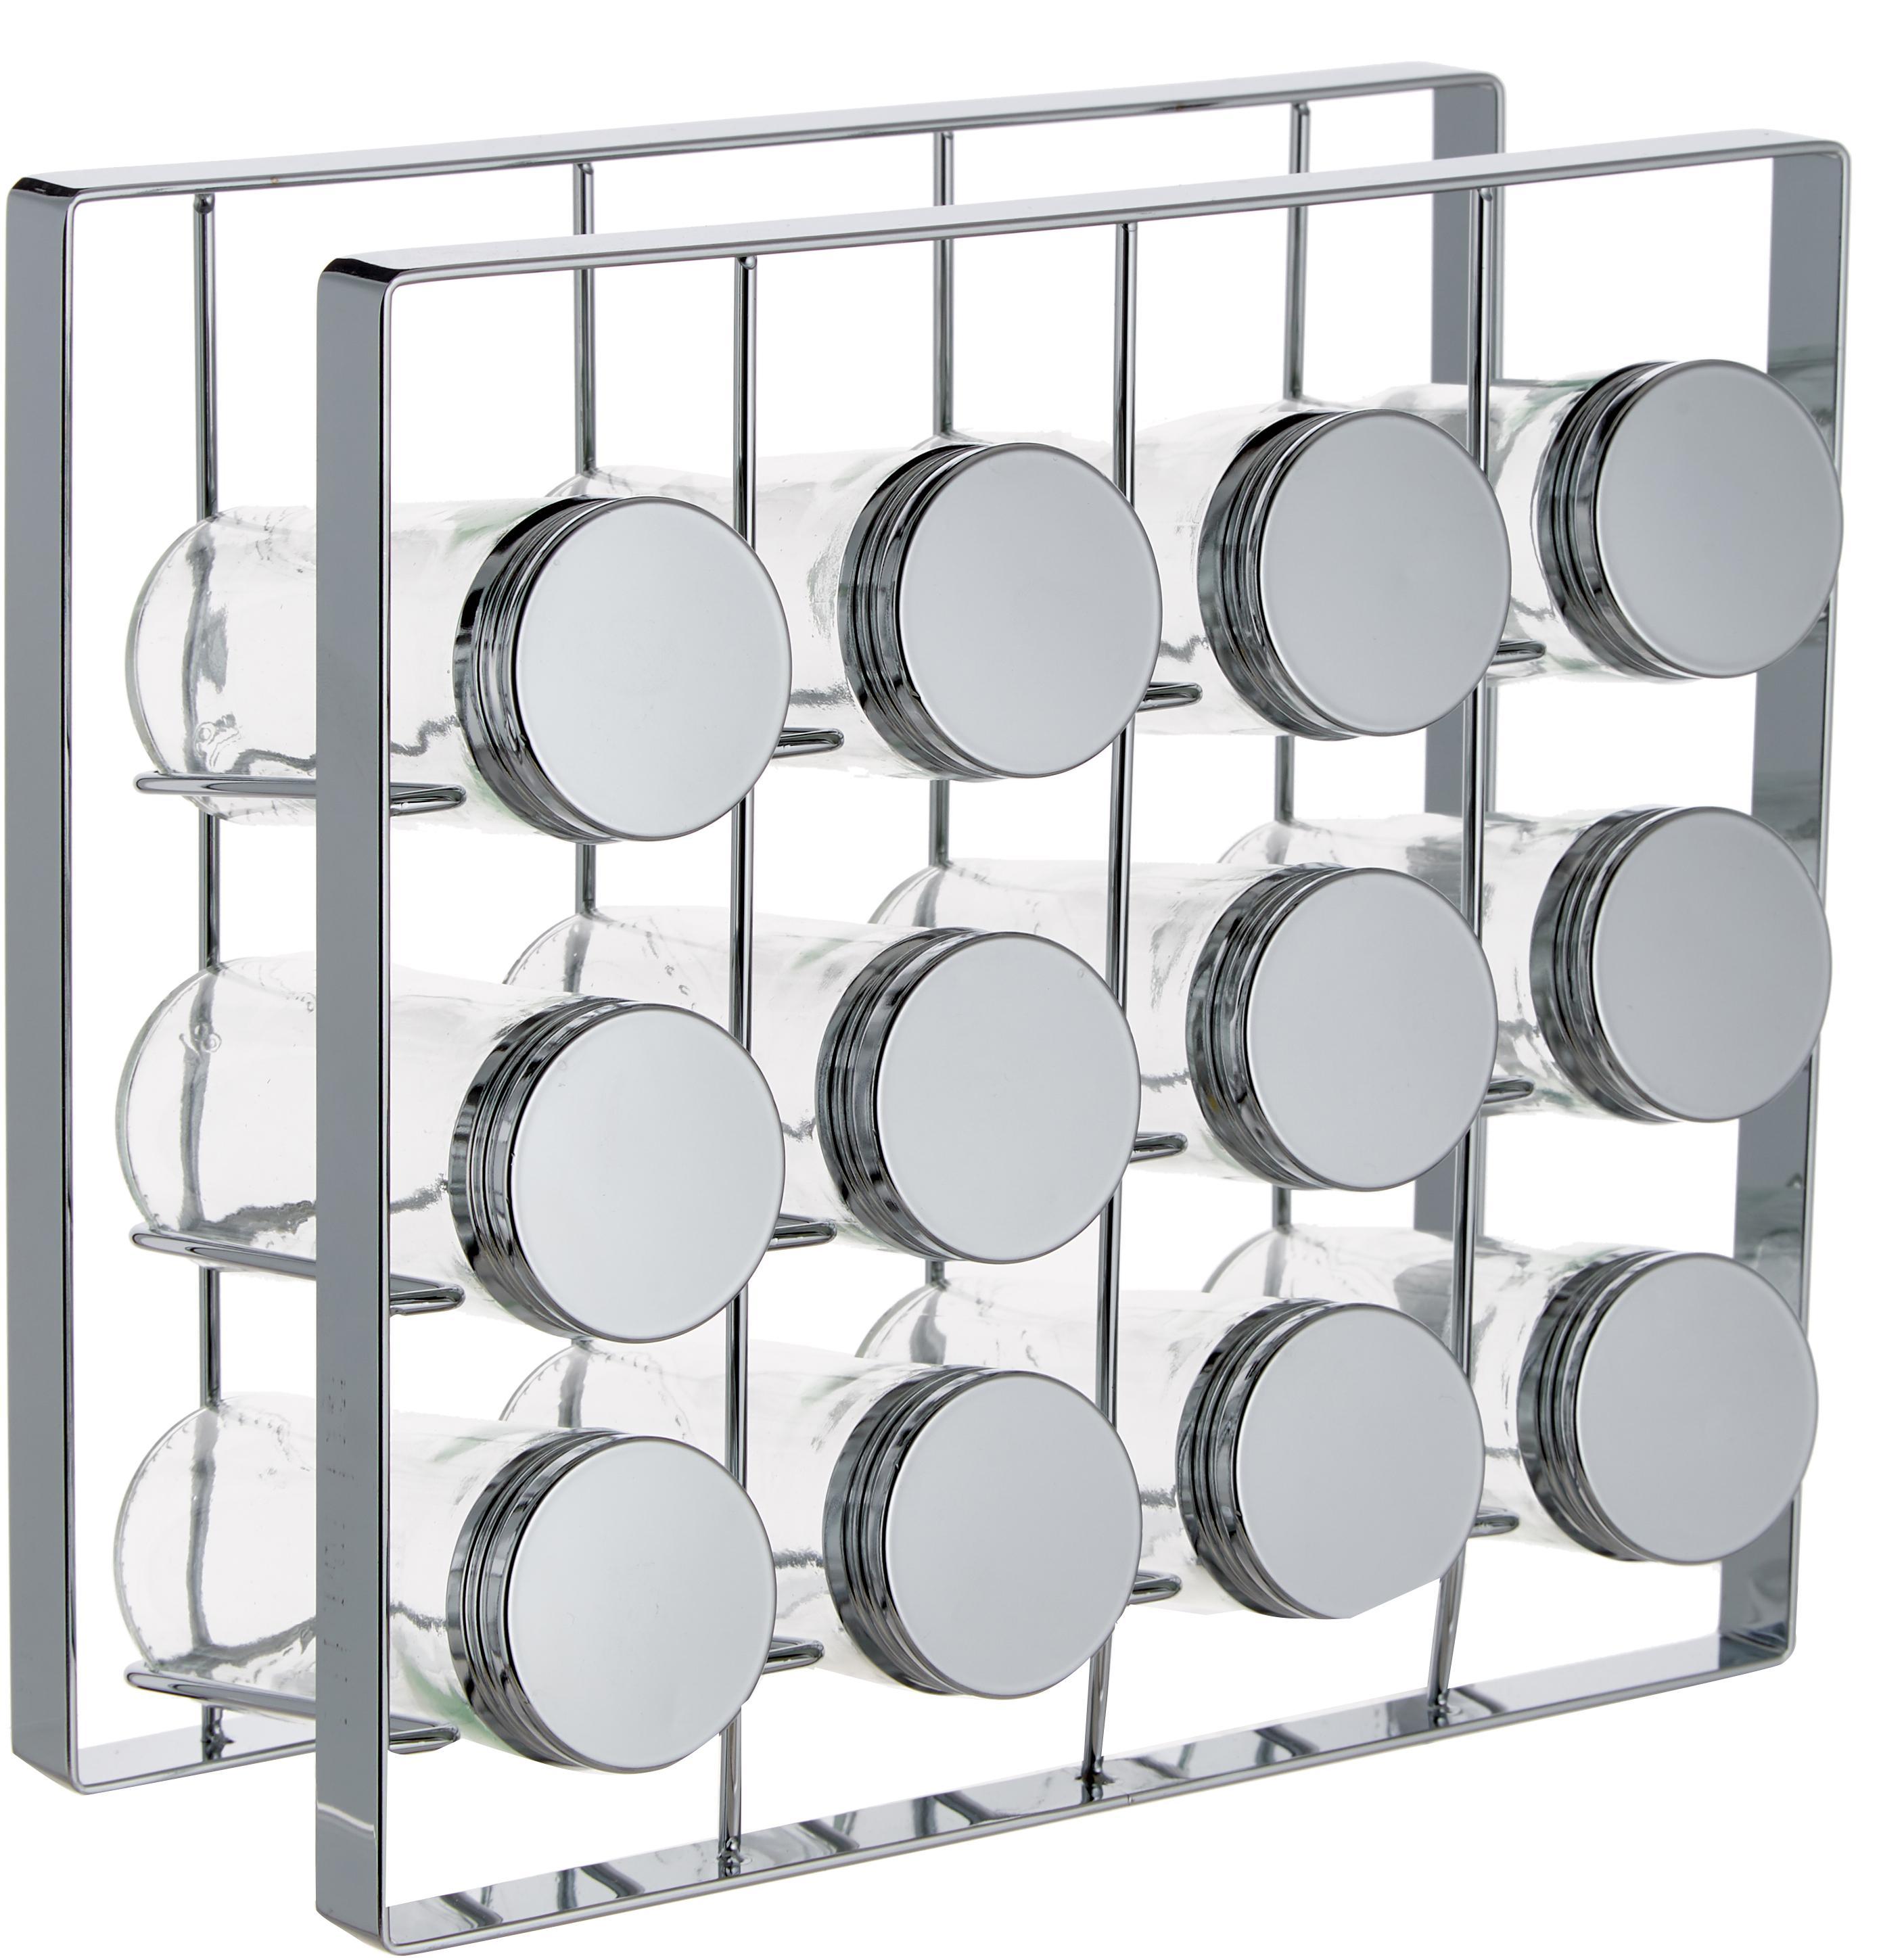 Organizador de especias Spices,13pzas., Estructura: metal pintado, Botes: vidrio, Plateado, An 24 x Al 22 cm